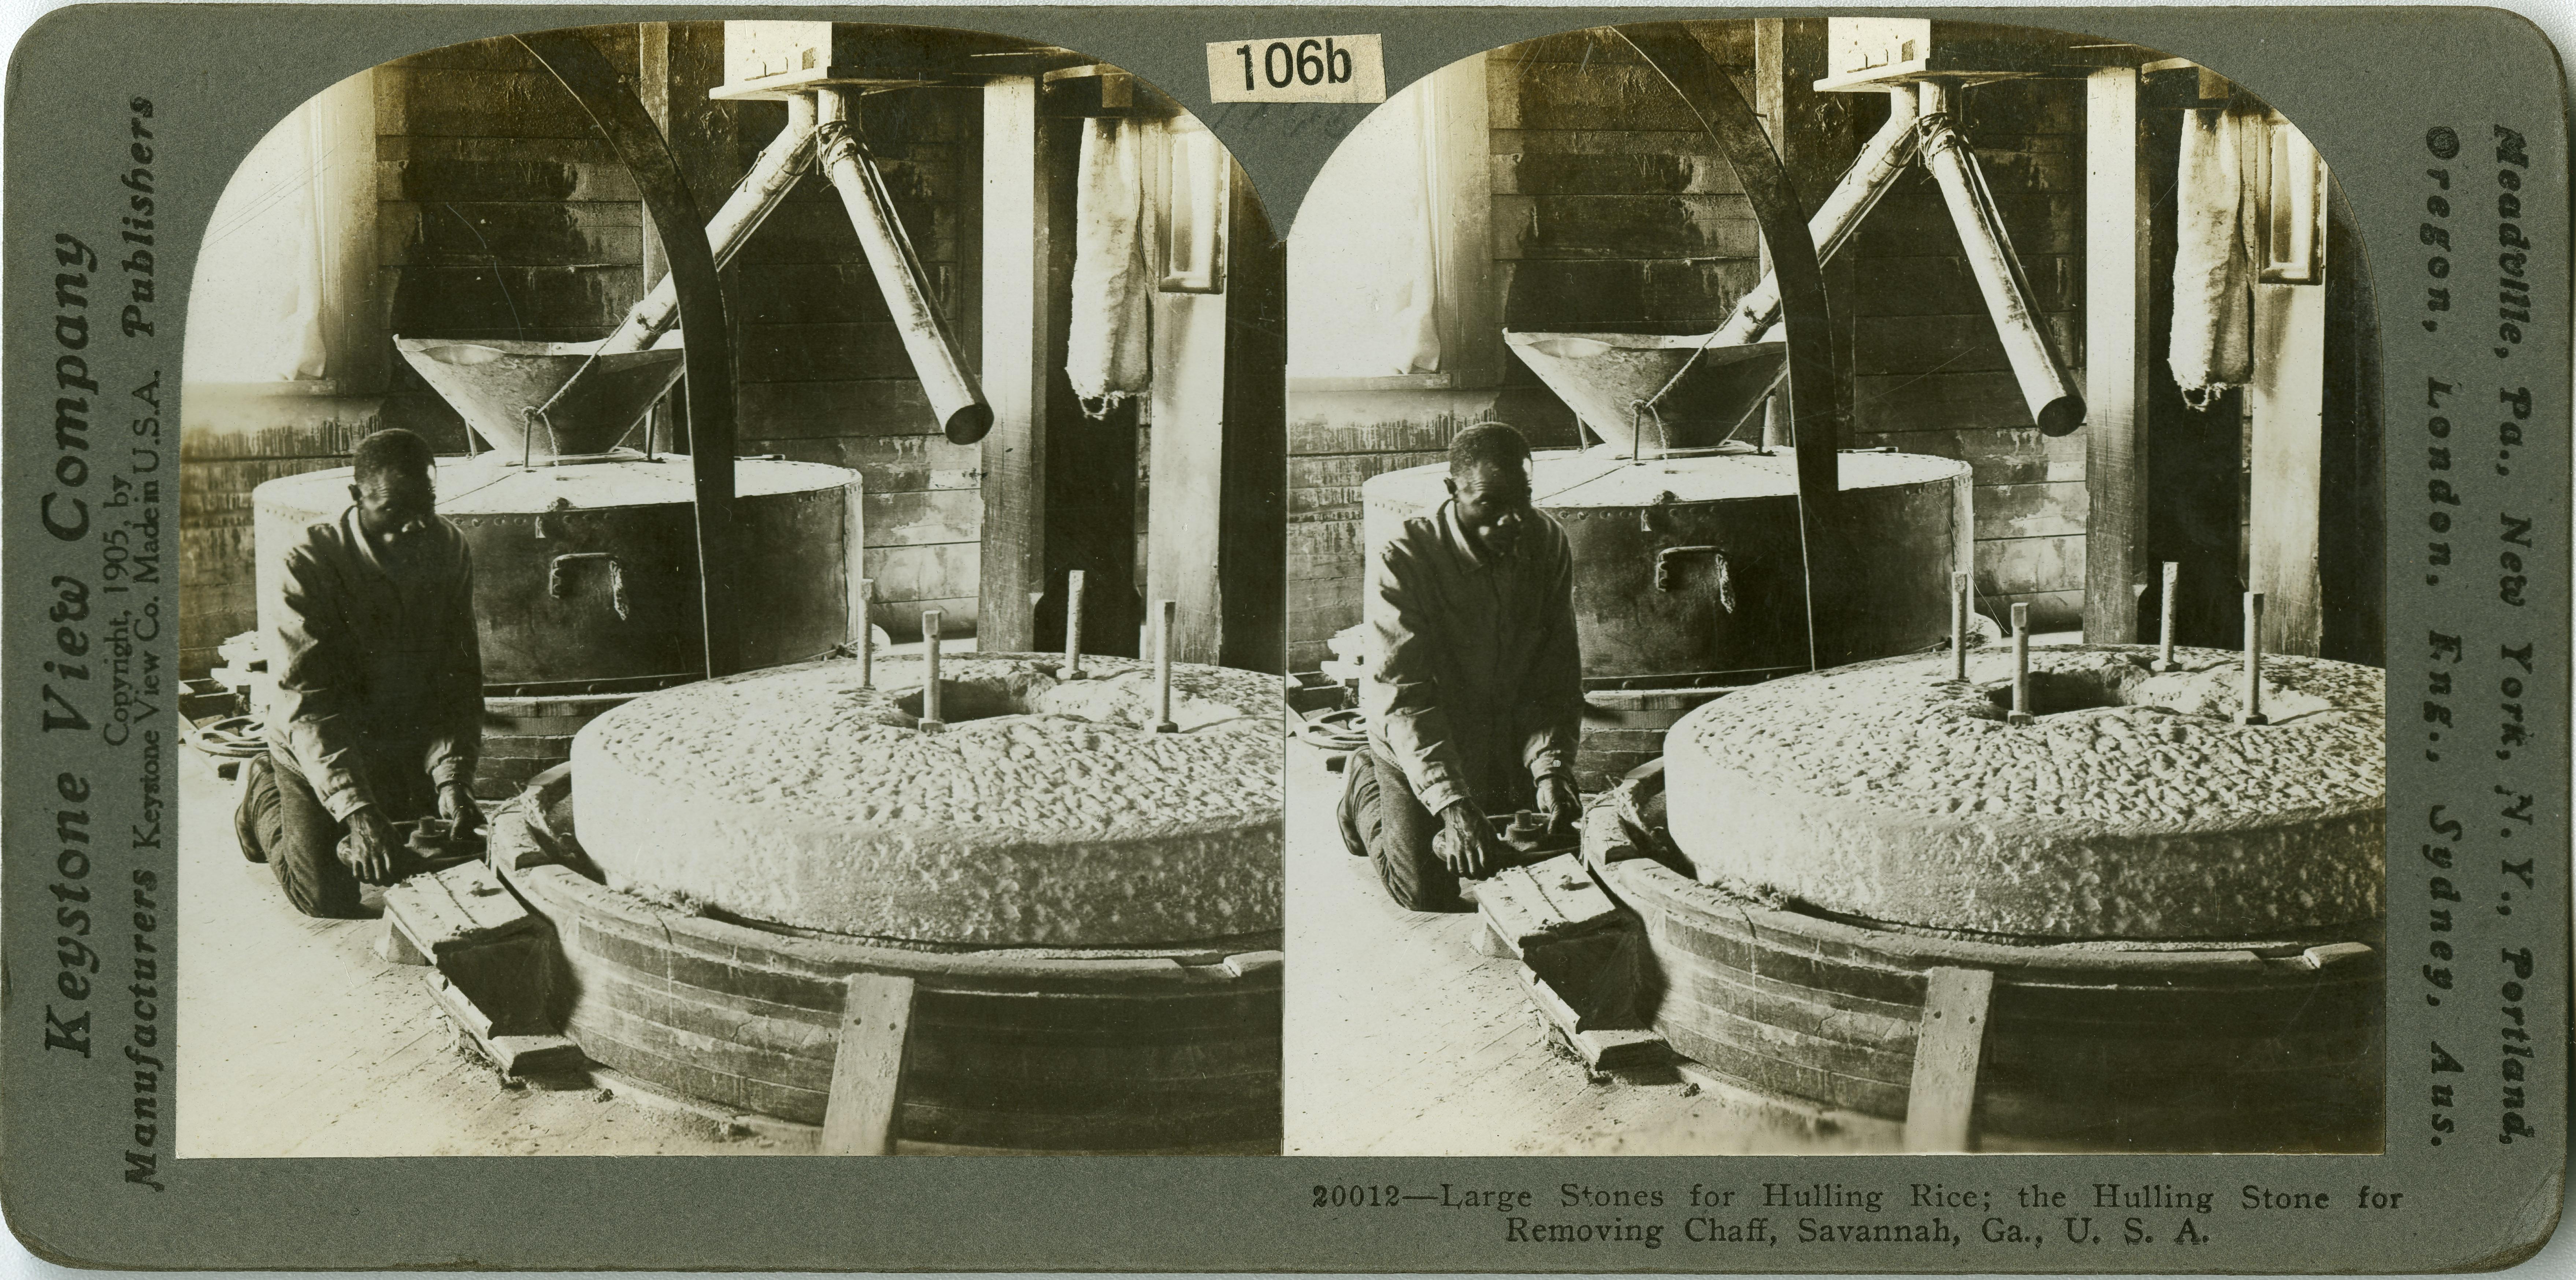 Large stones for hulling rice, Savannah, Ga.